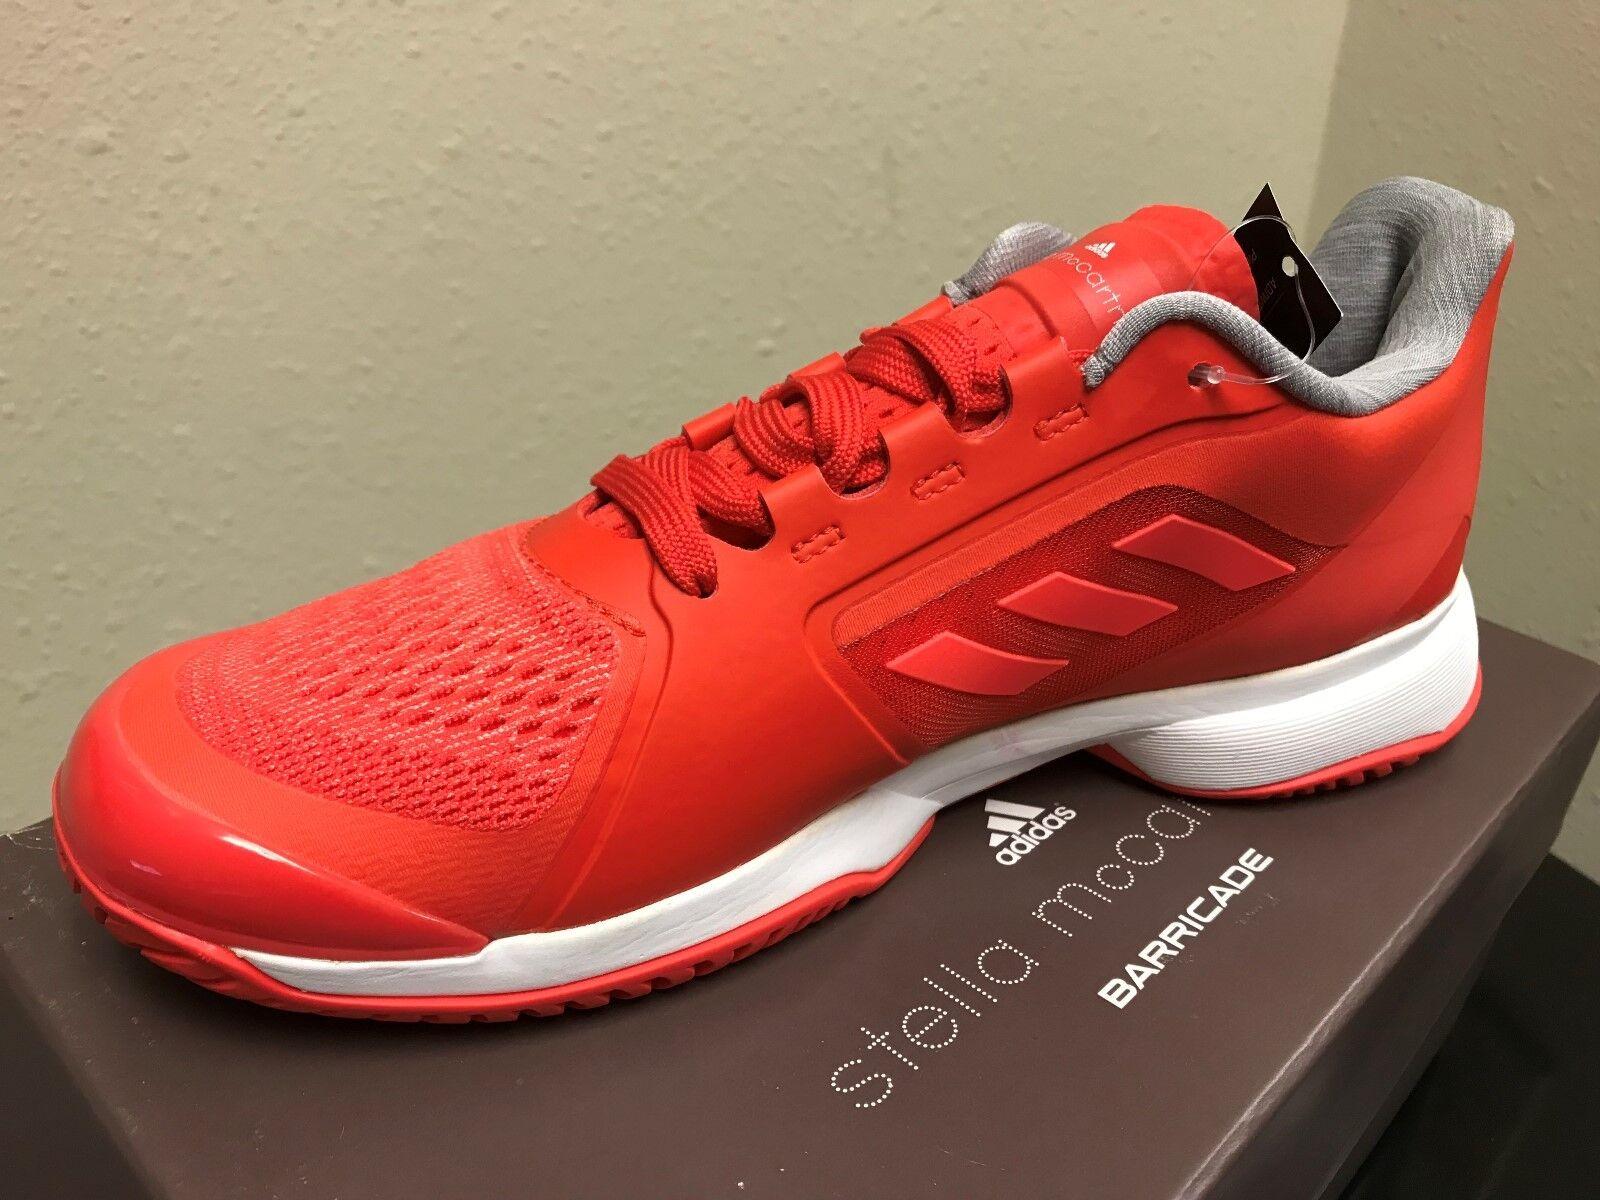 Adidas Women's aSMC Barricade AQ6296 2017 Tennis Shoe Style AQ6296 Barricade 917193